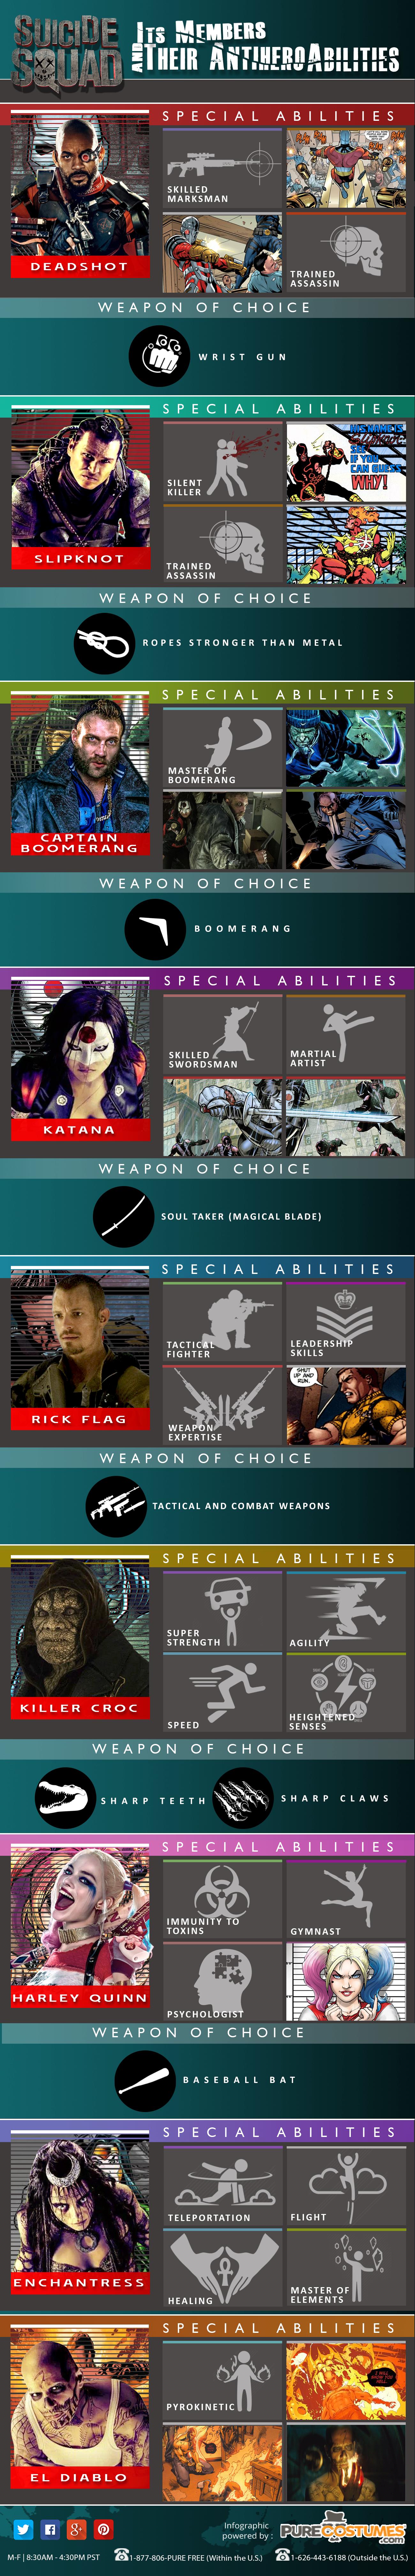 Suicide Squad Infographic